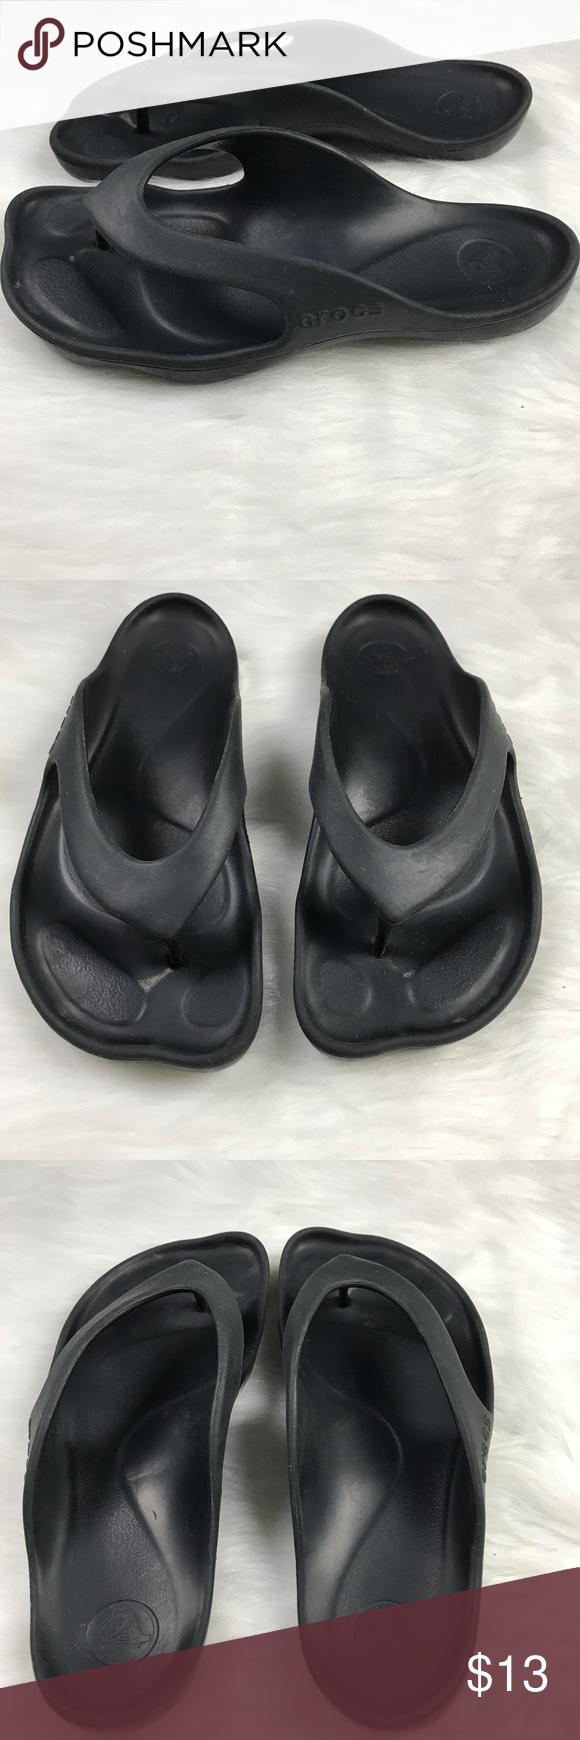 1e072d678e00 Crocs Black Basic Flip Flops Arch Foot Support Crocs Women s Black Basic  Flip Flops Size 8 Arch Foot Support Slide On Rubber Flip Flop is slip on